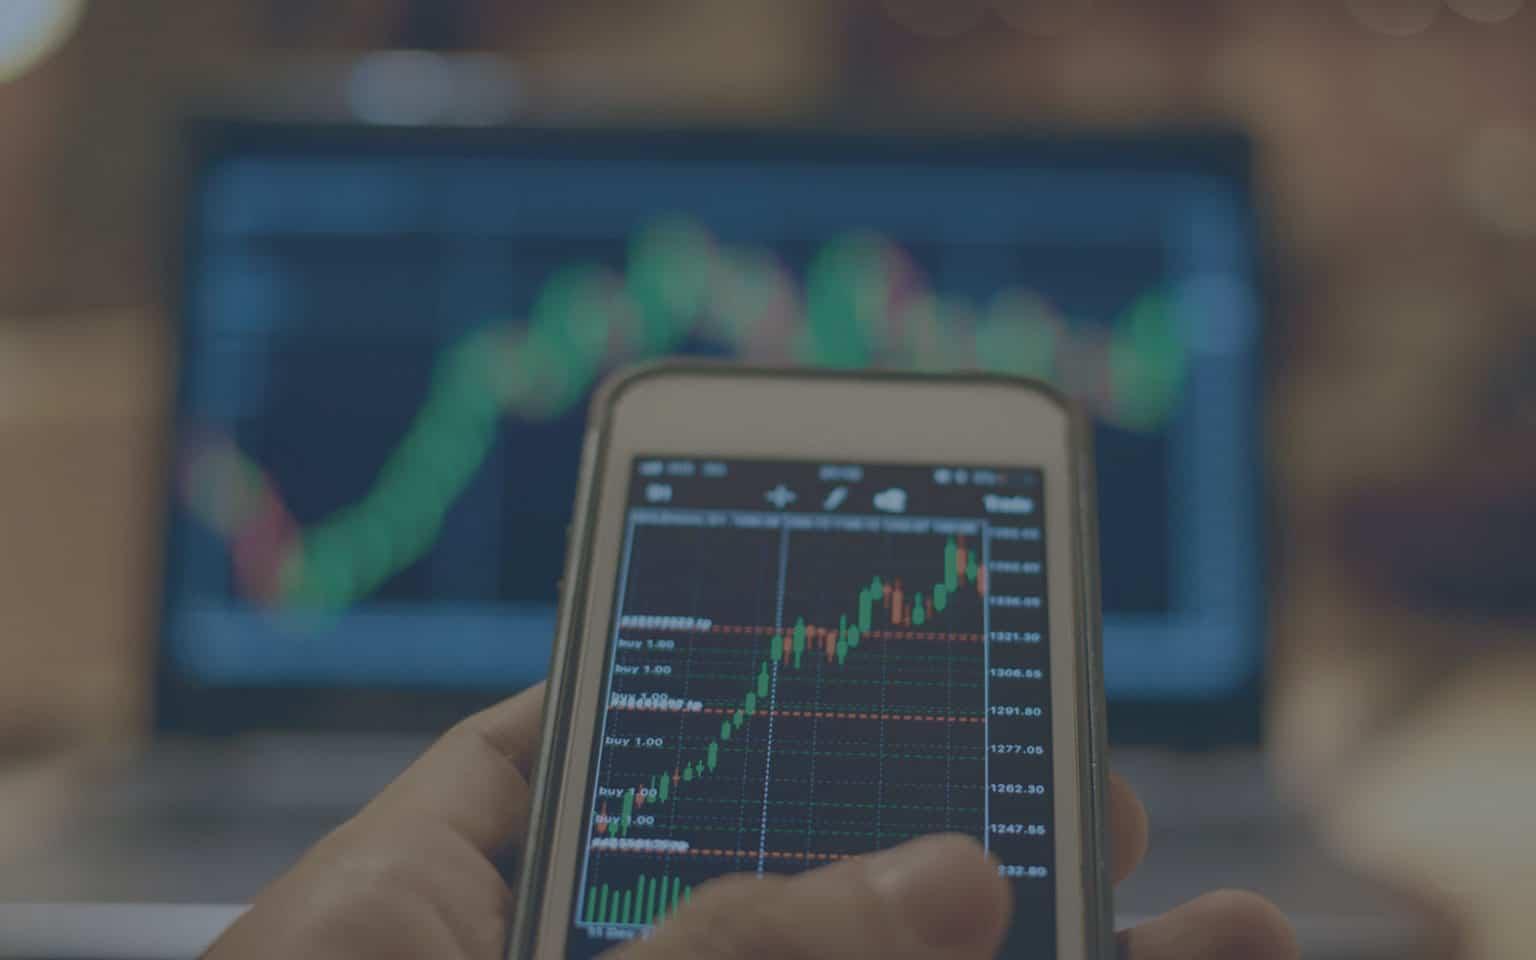 perfil moderado de investidor olhando gráficos